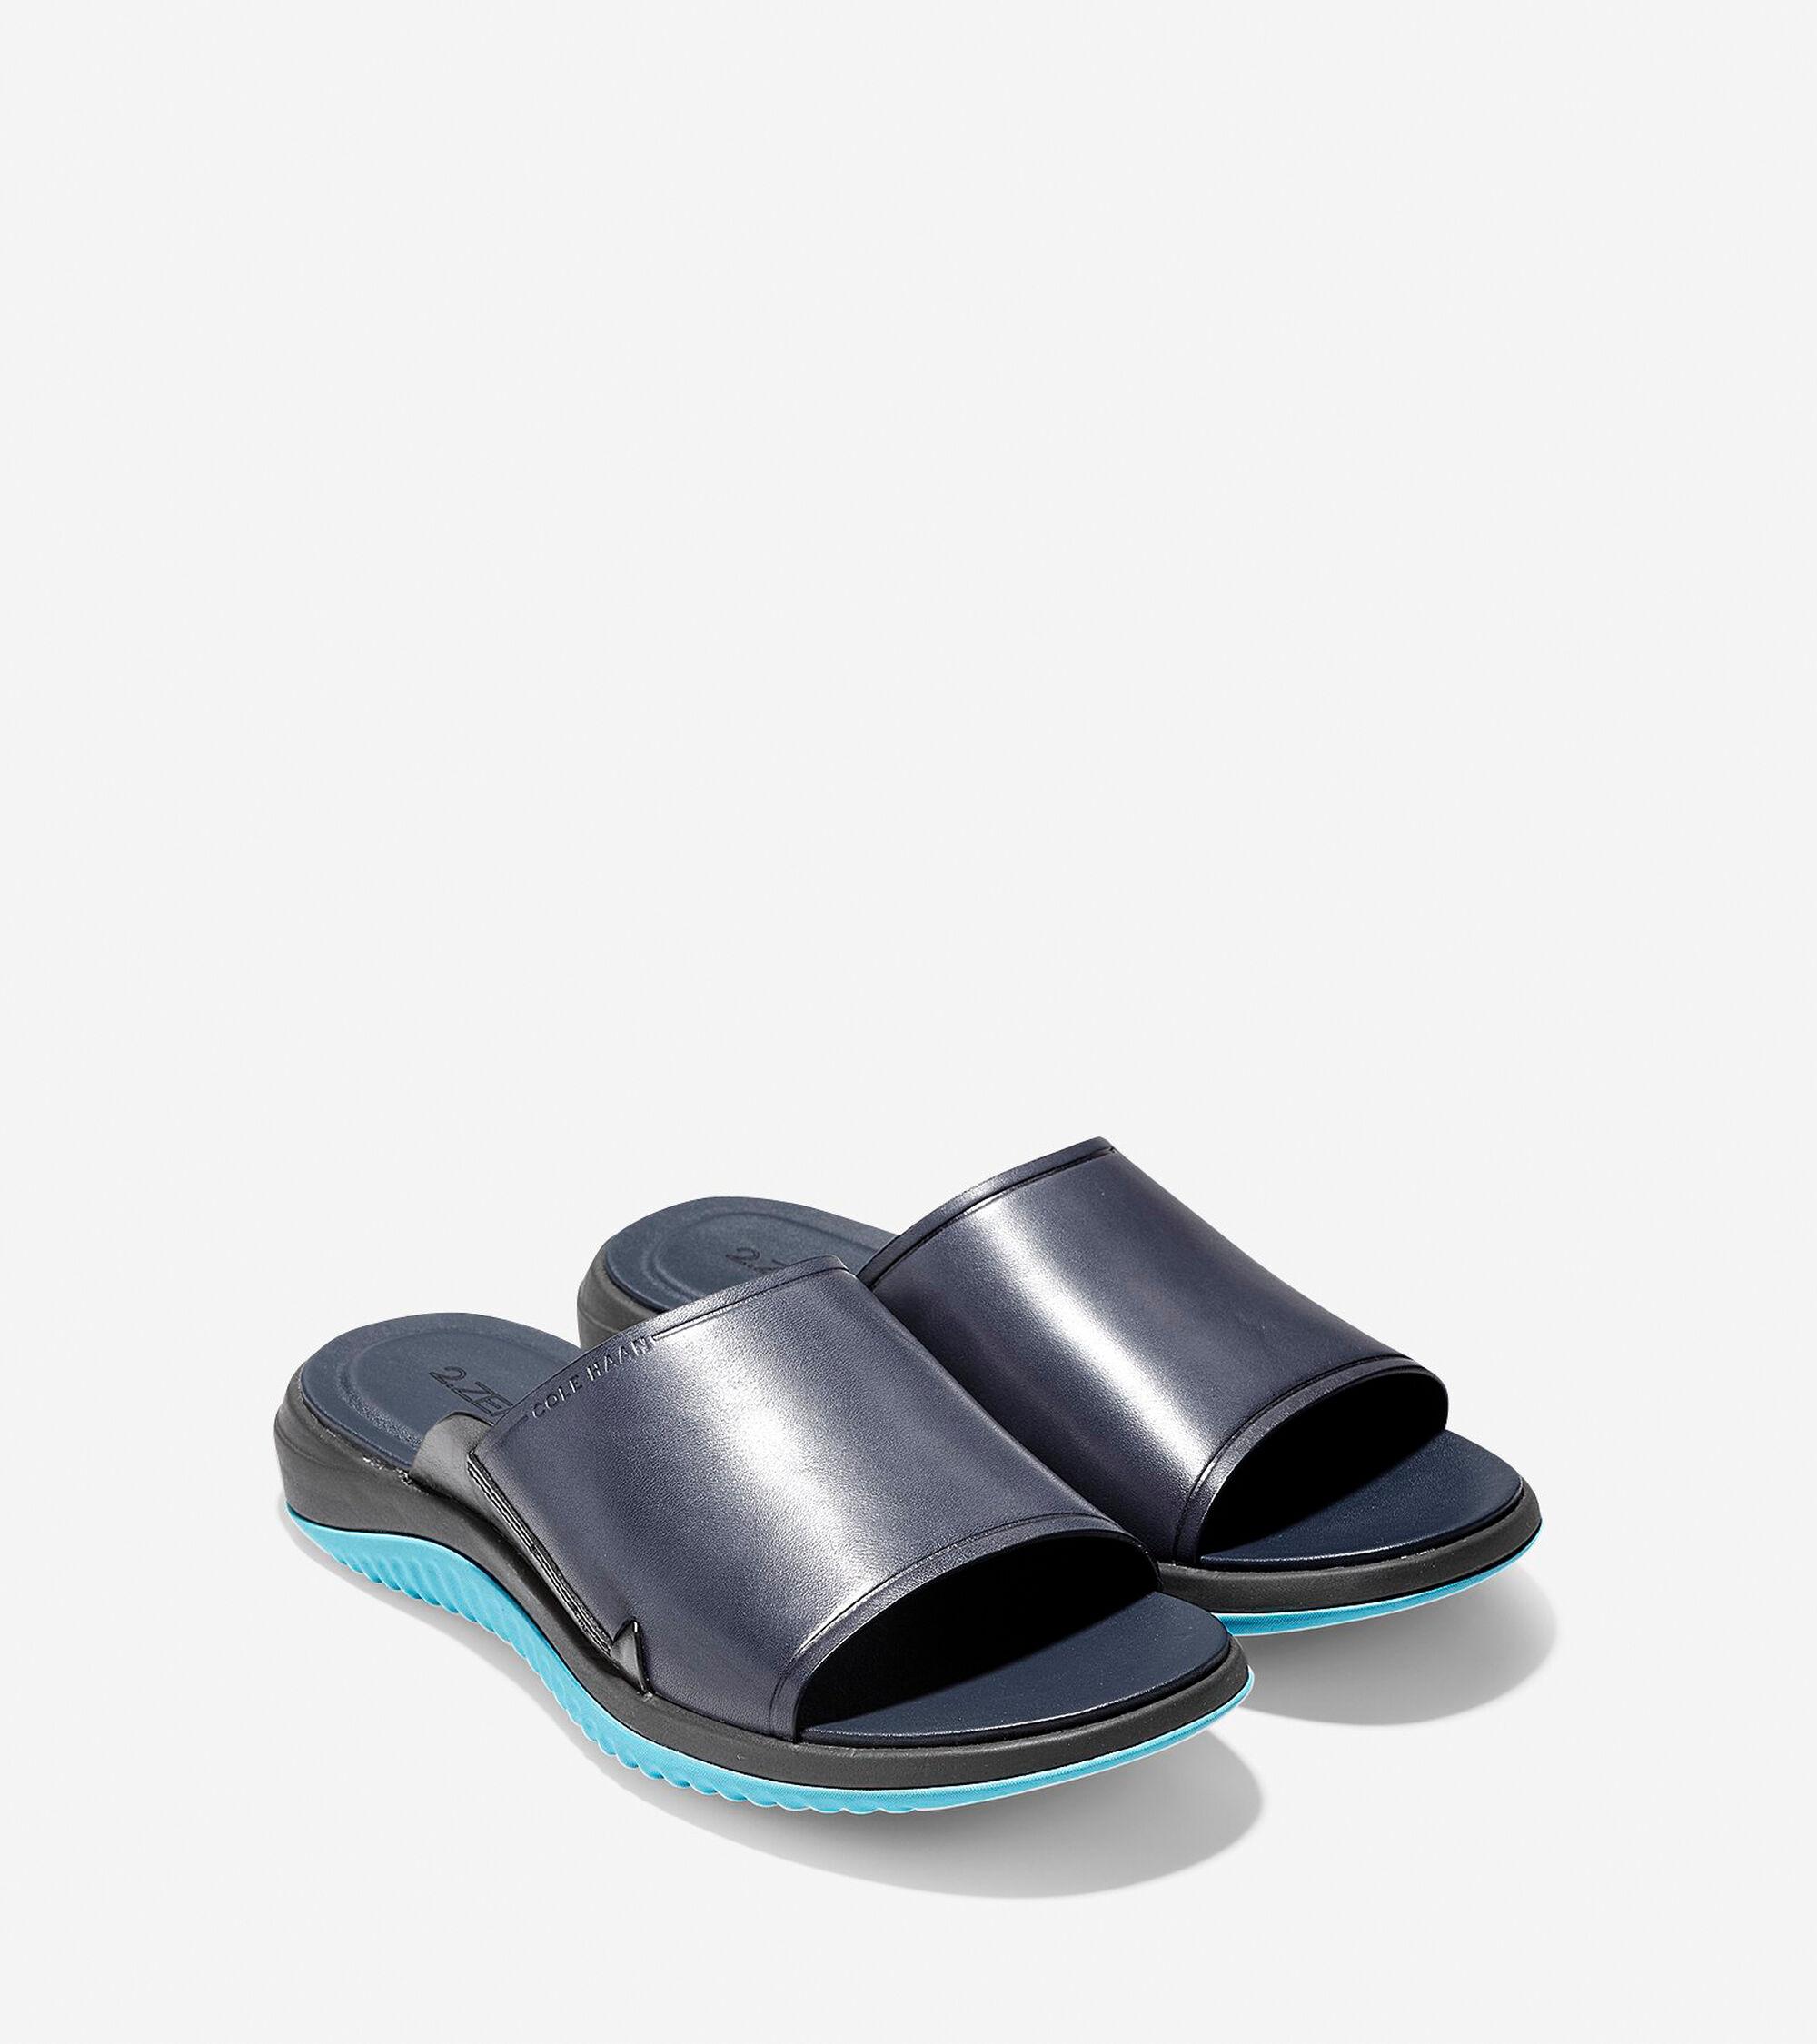 7497b4e1376c Men s 2.ZEROGRAND Slide Sandals in Marine Blue